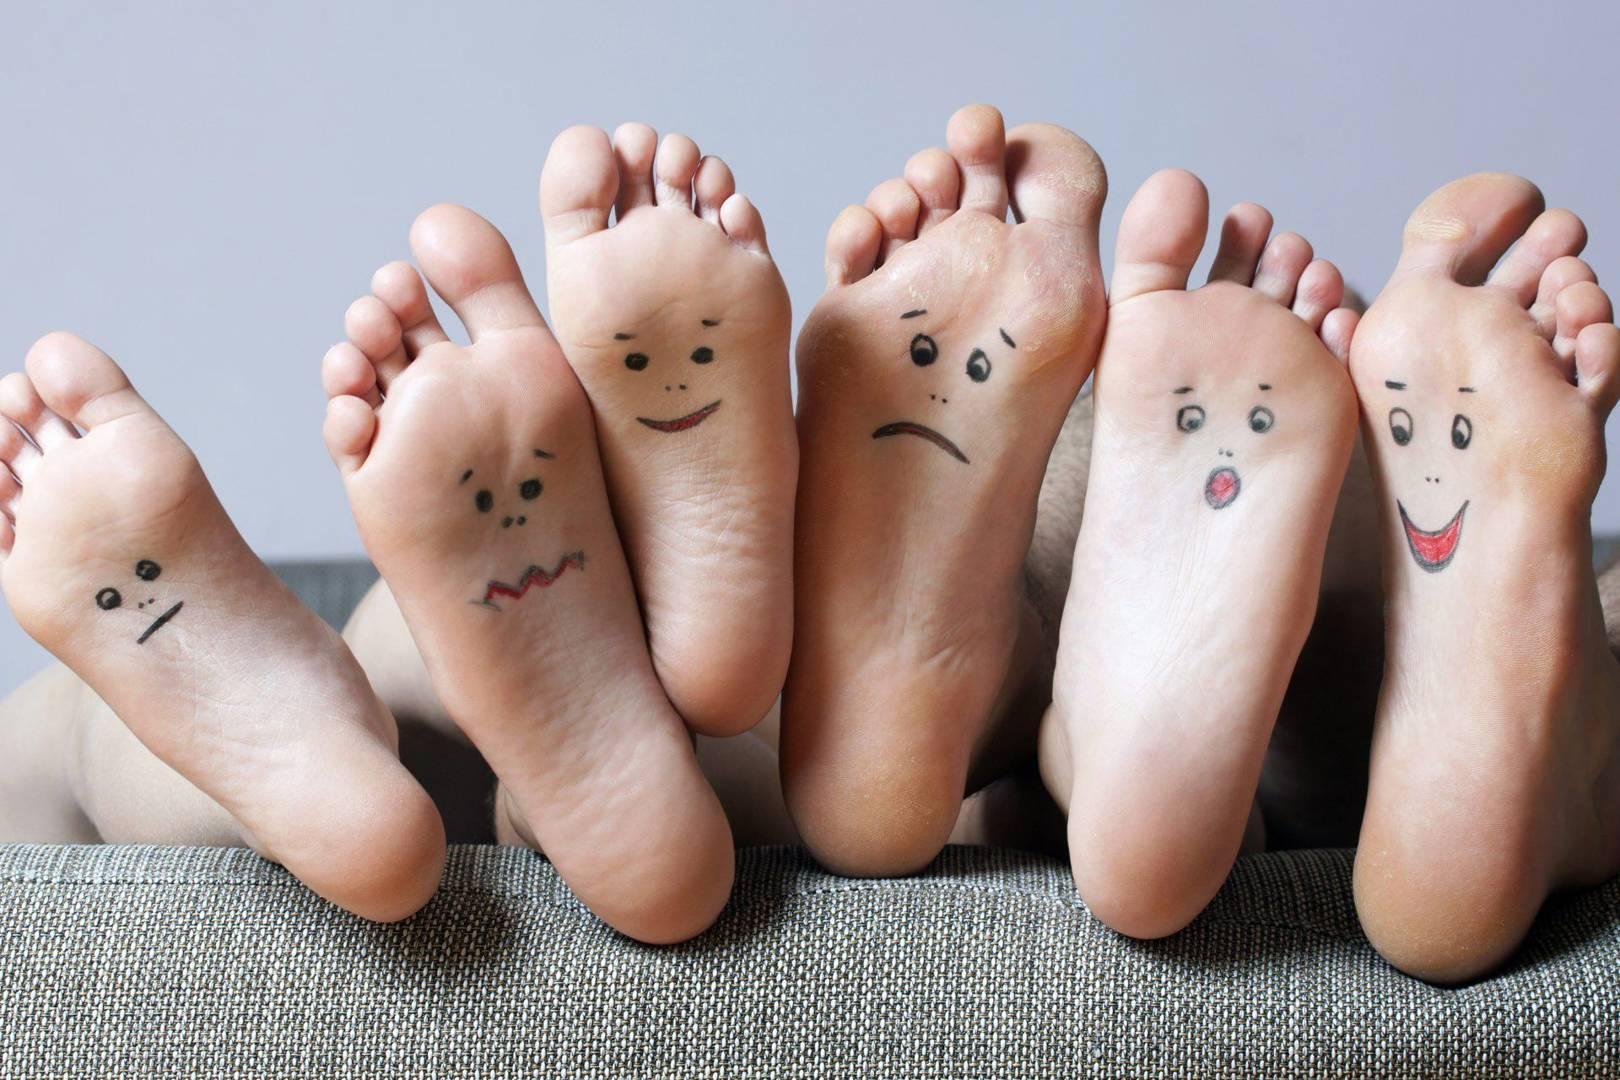 Feet Feet.eu naked (46 photos), Sexy, Leaked, Instagram, butt 2019